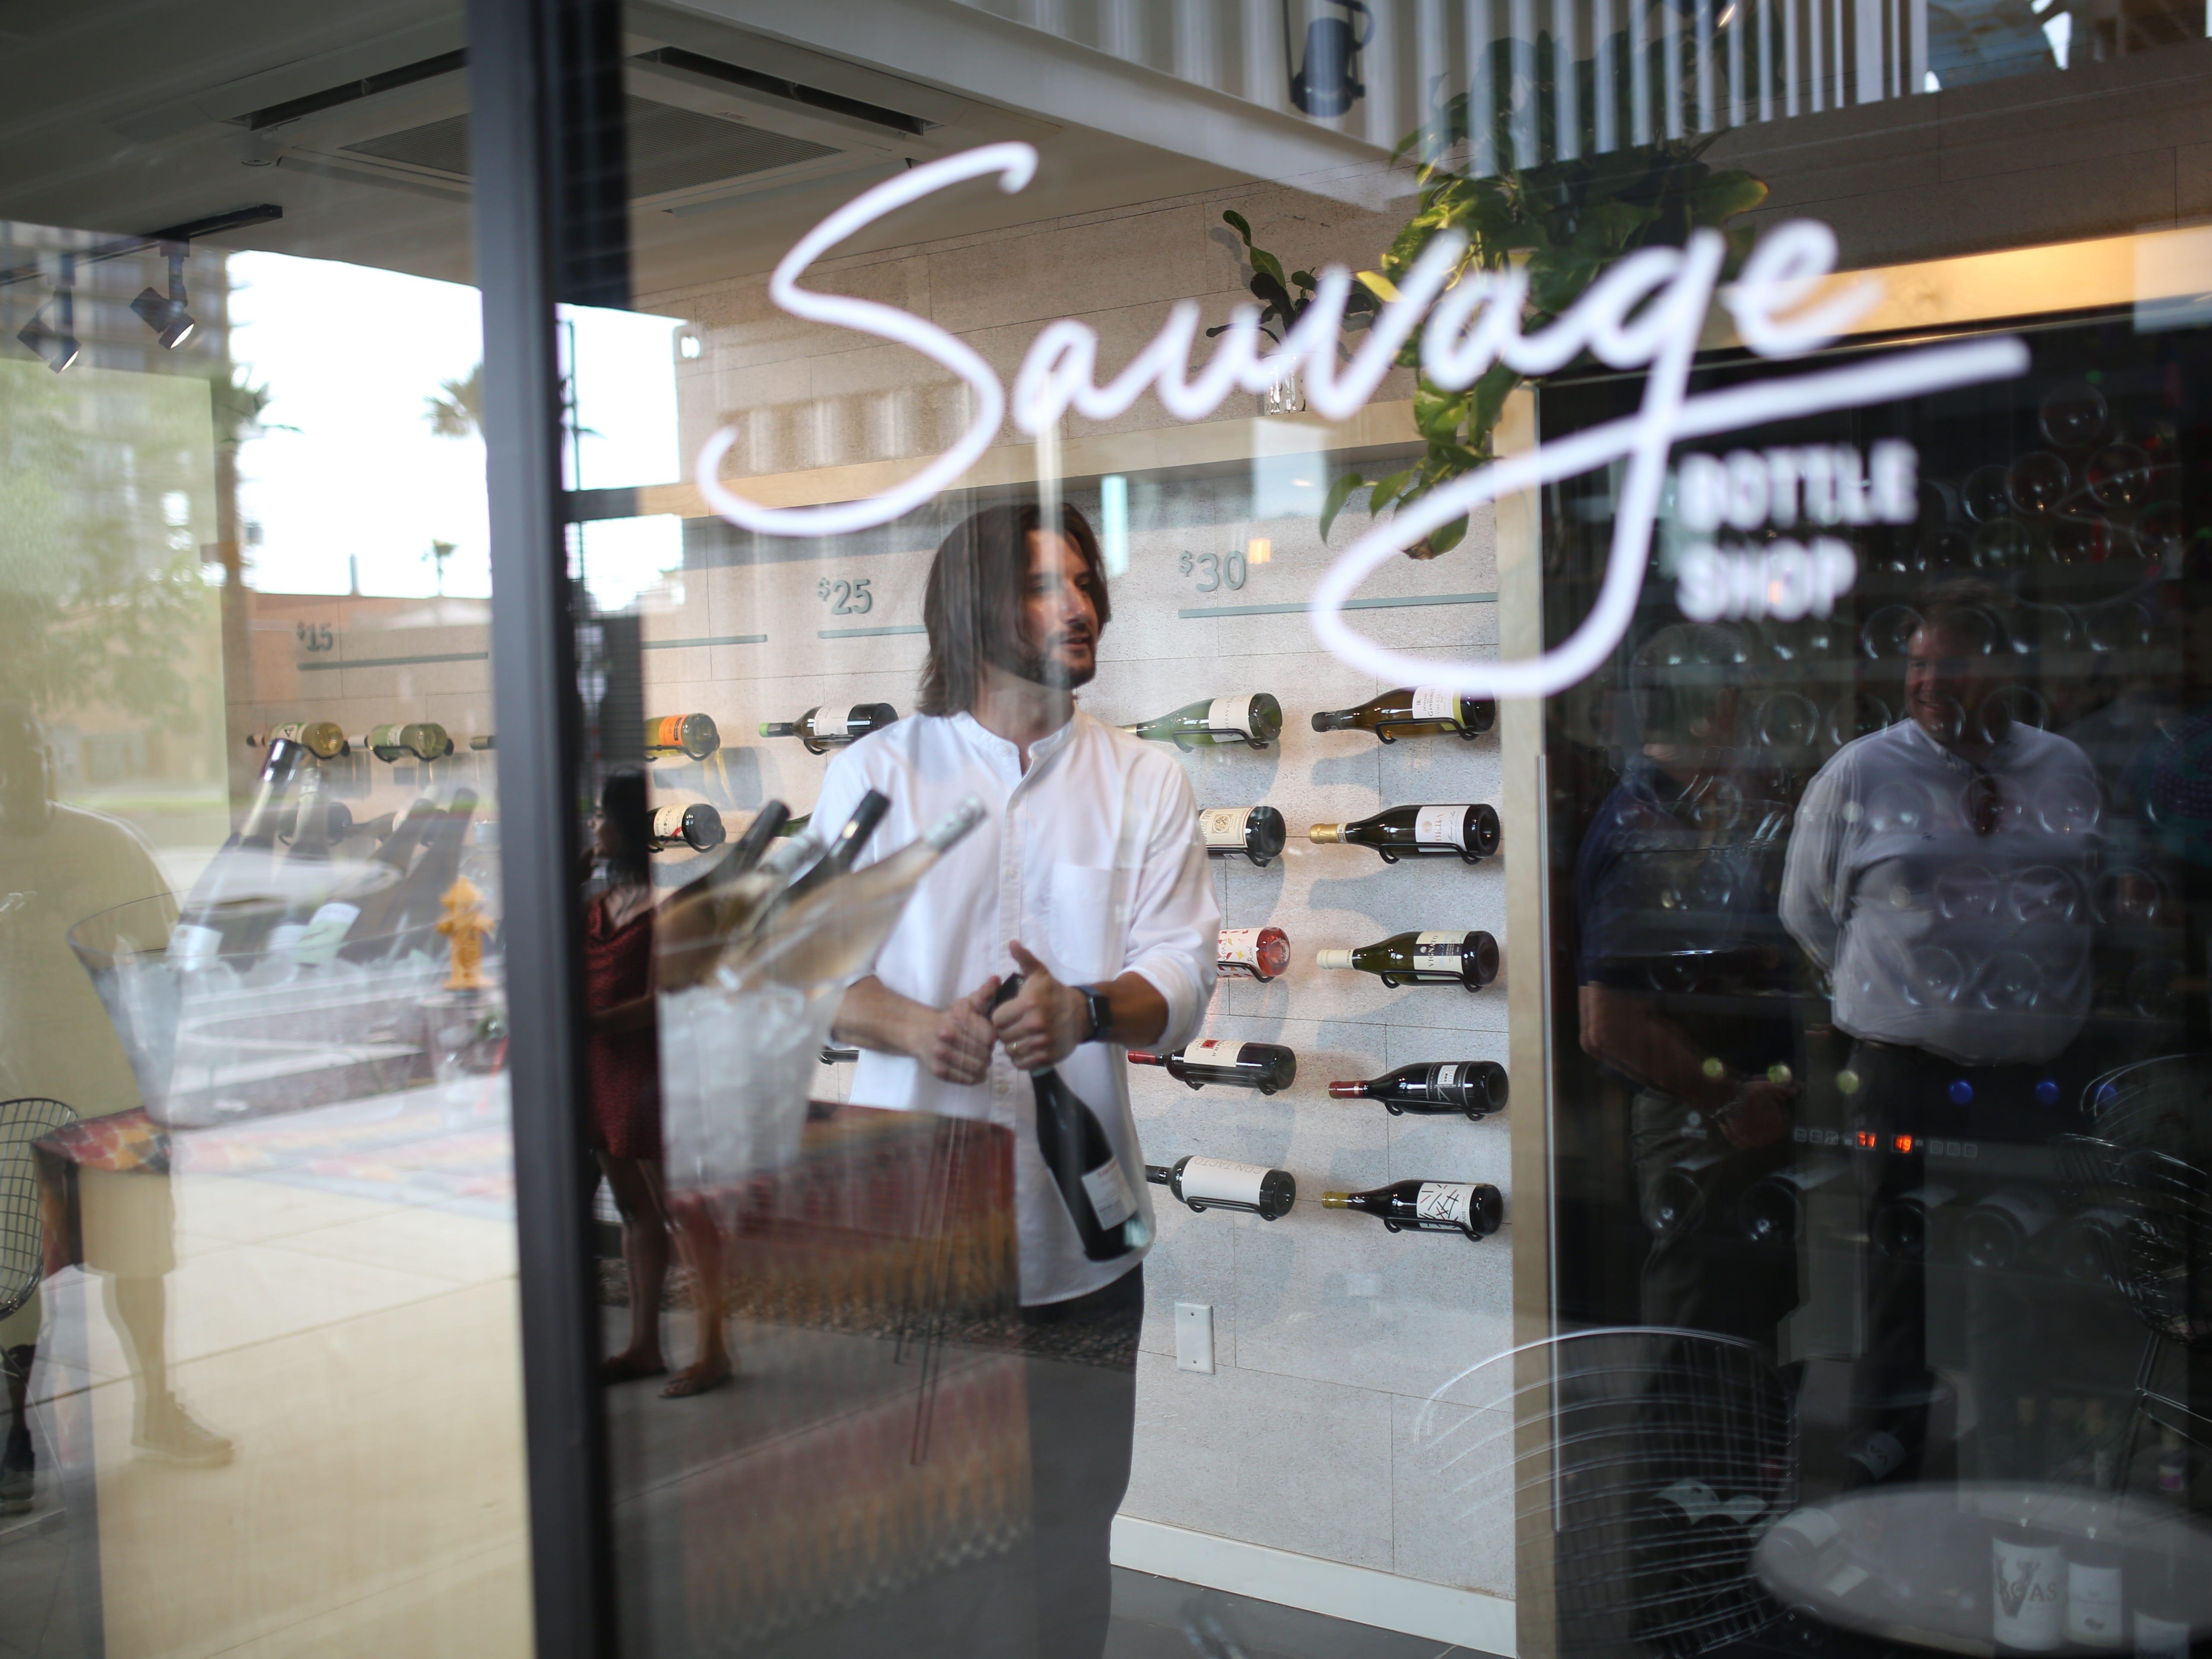 10 best local wine stores in Phoenix